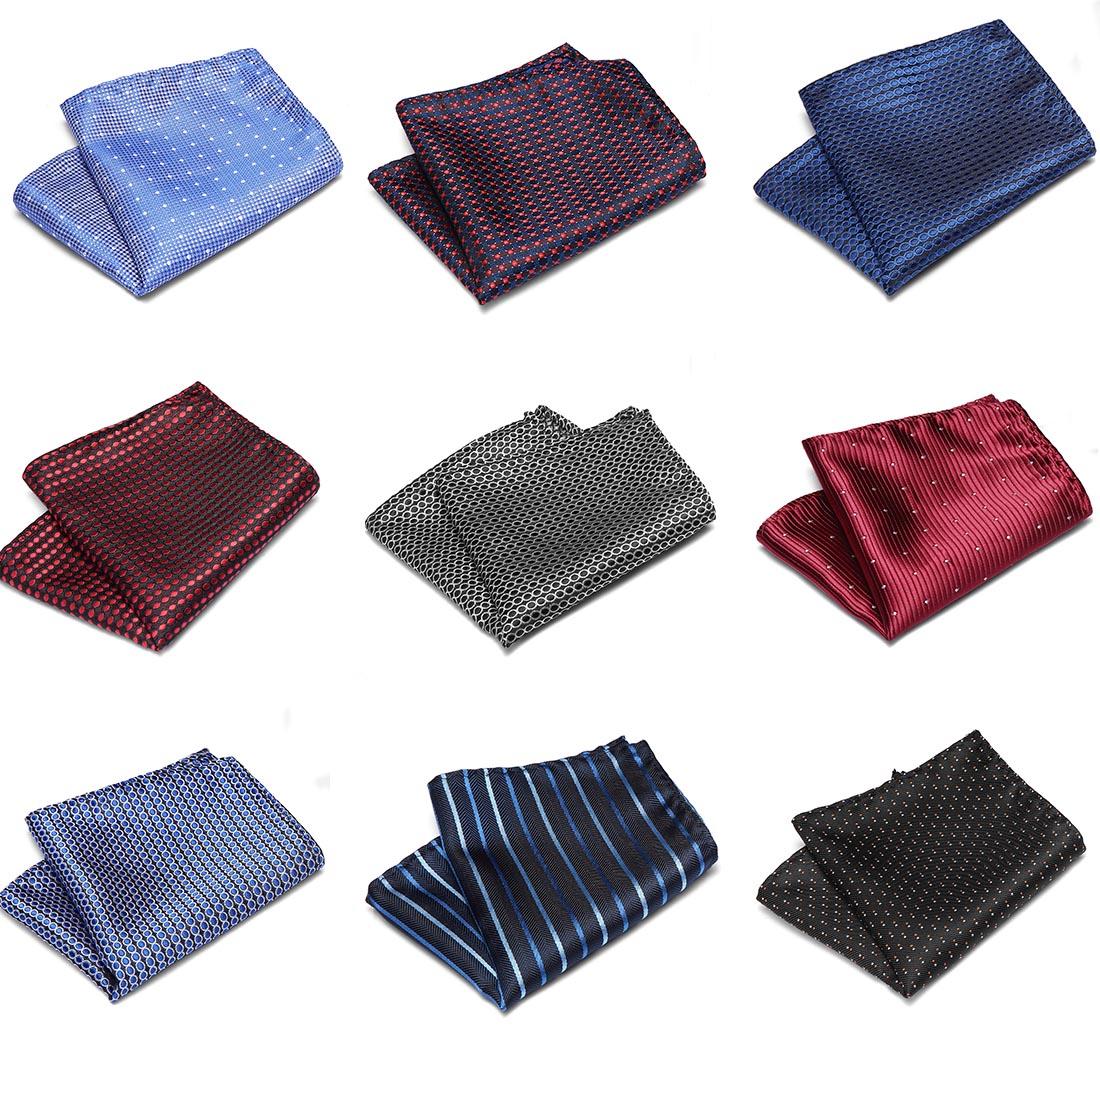 Luxury Men's Handkerchief Polka Dot Striped Floral Printed Hankies Silk Hanky Business Wedding Pocket Square Chest Towel 22*22CM